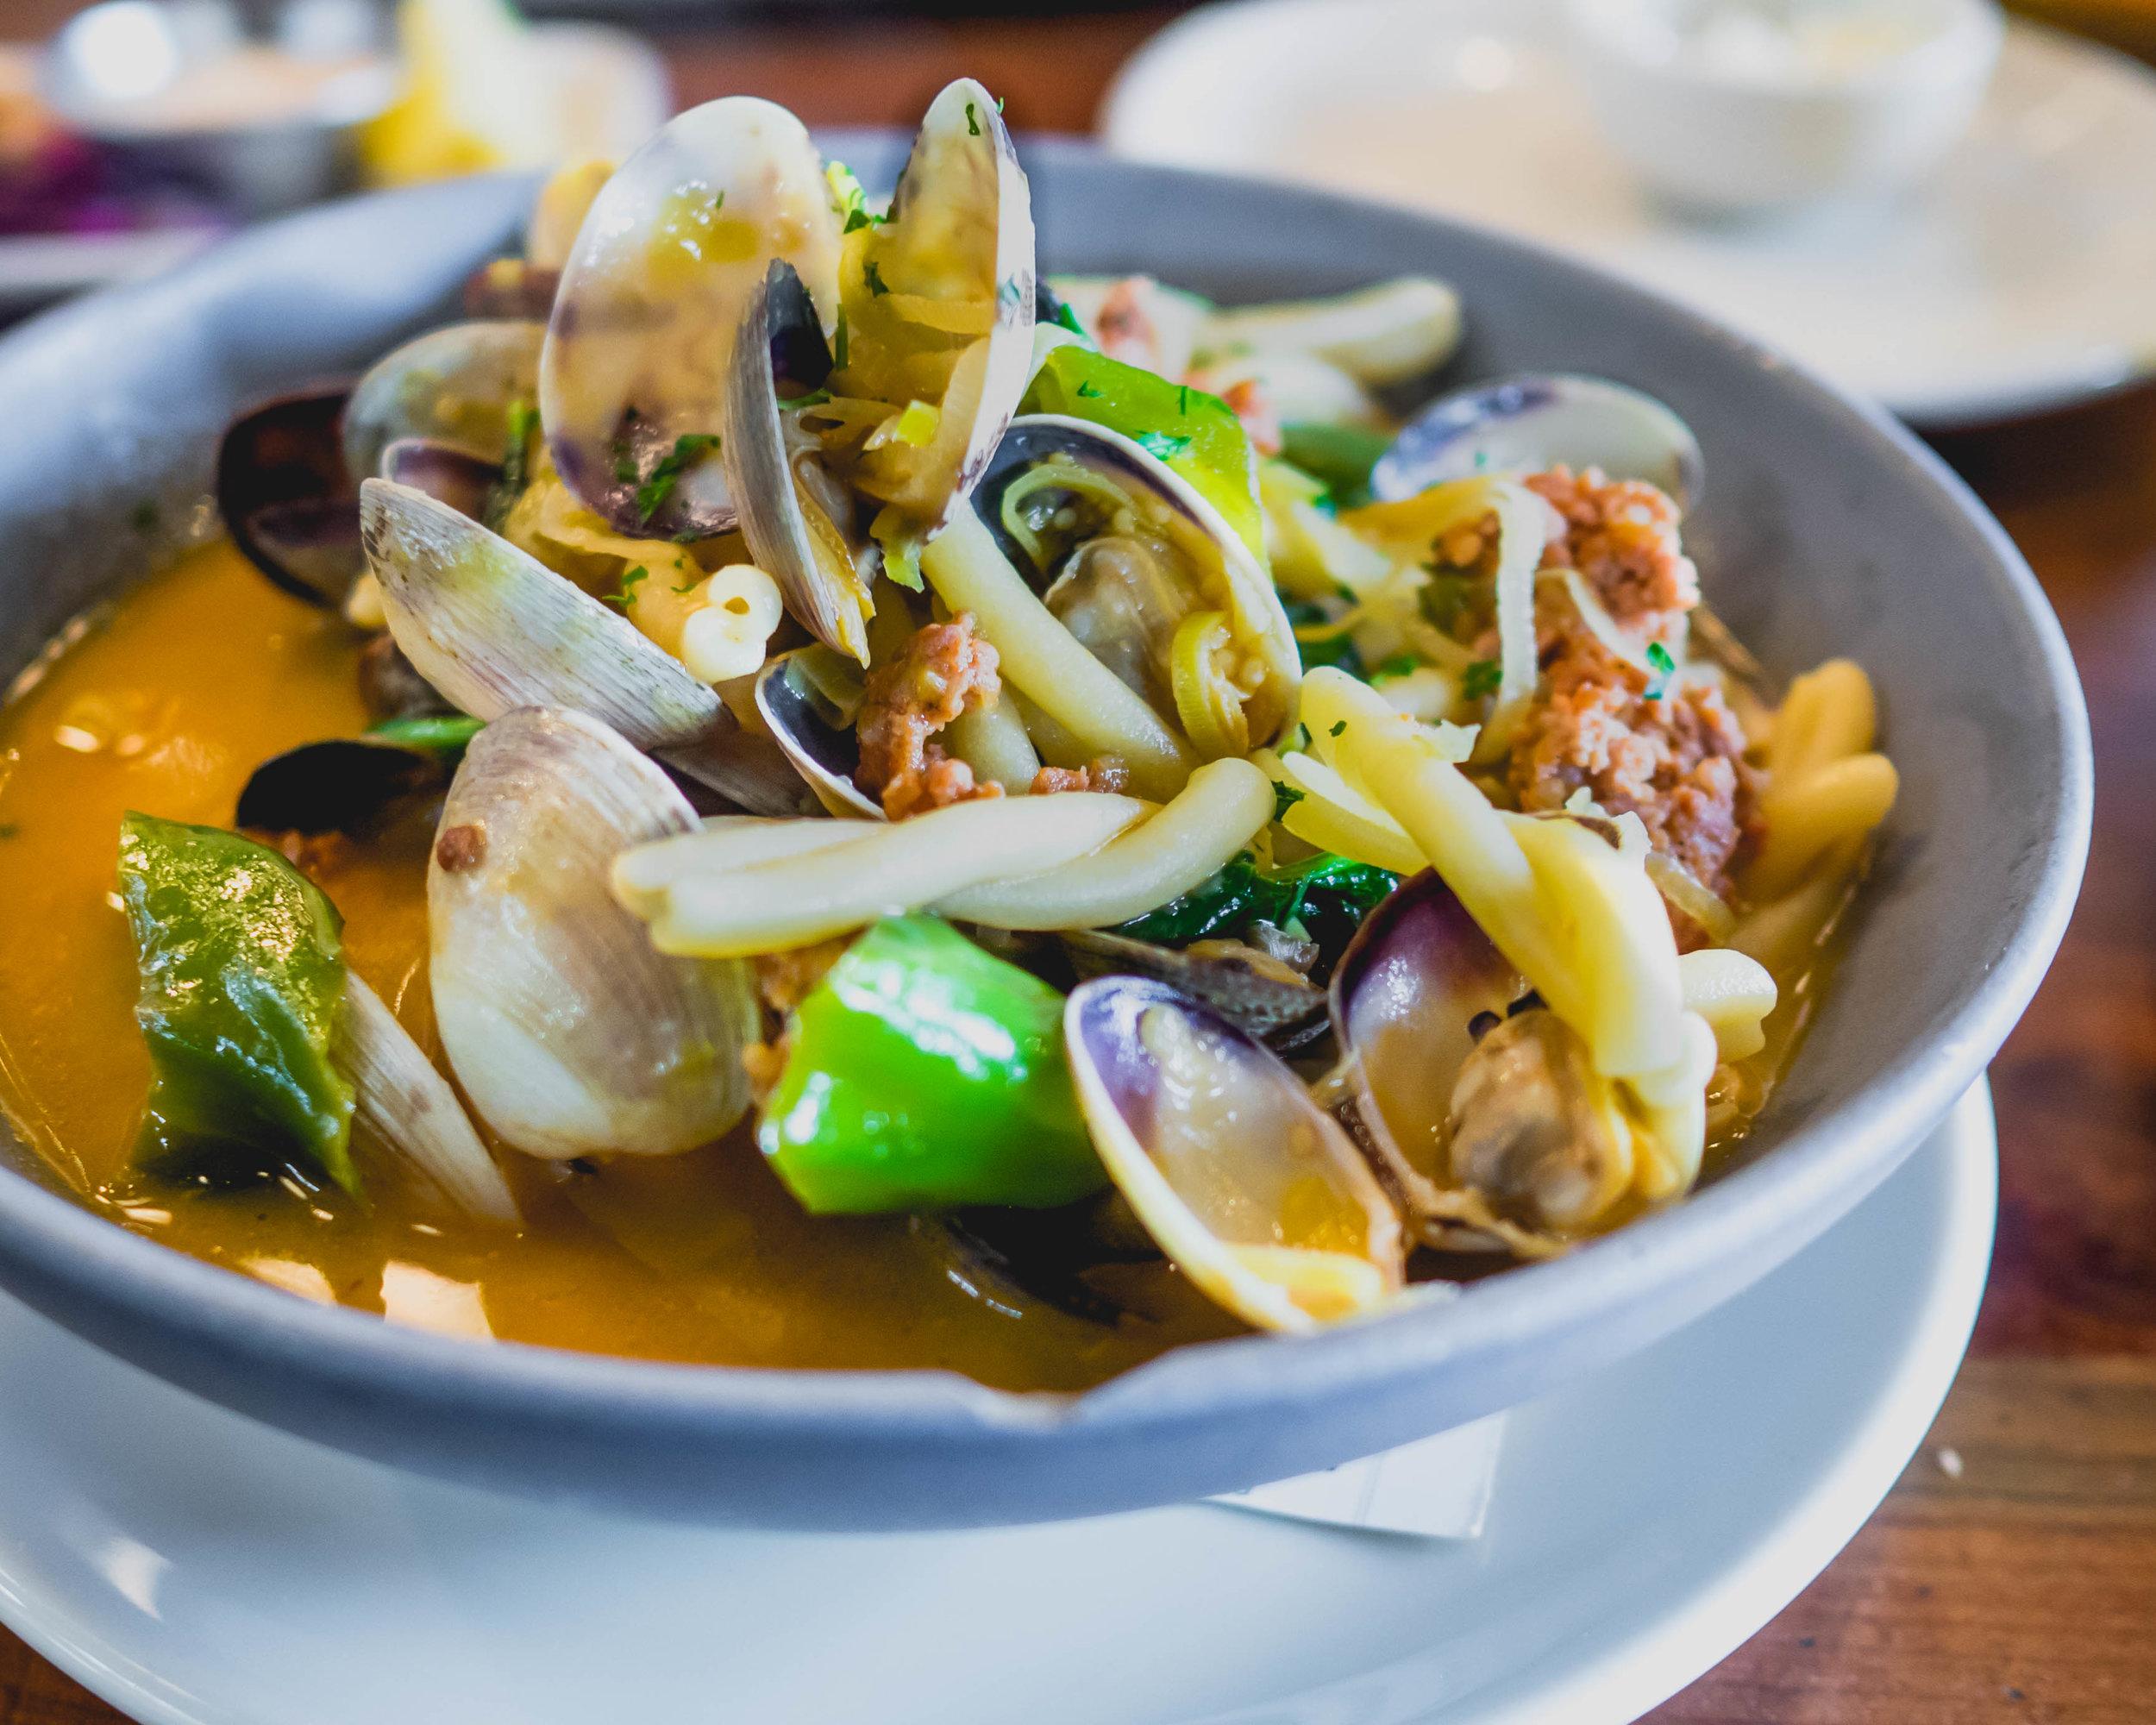 steamers with pasta : manila clams, chorizo, shishito pepper, leek top, tomatillo sauce, white wine, butter.